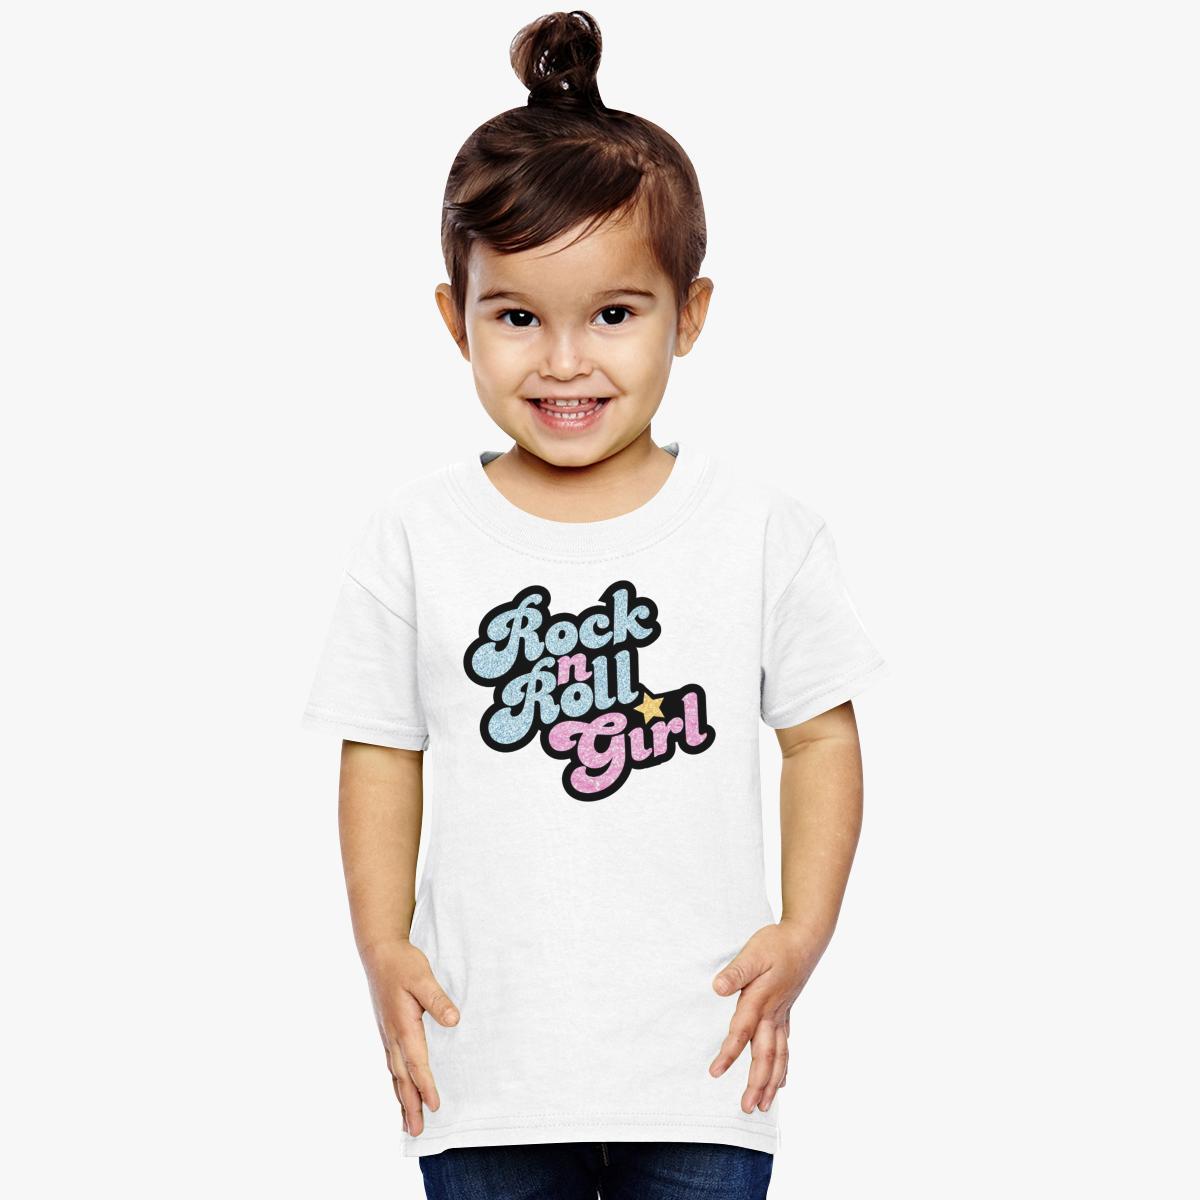 Rock n' Roll Girl Toddler T-shirt